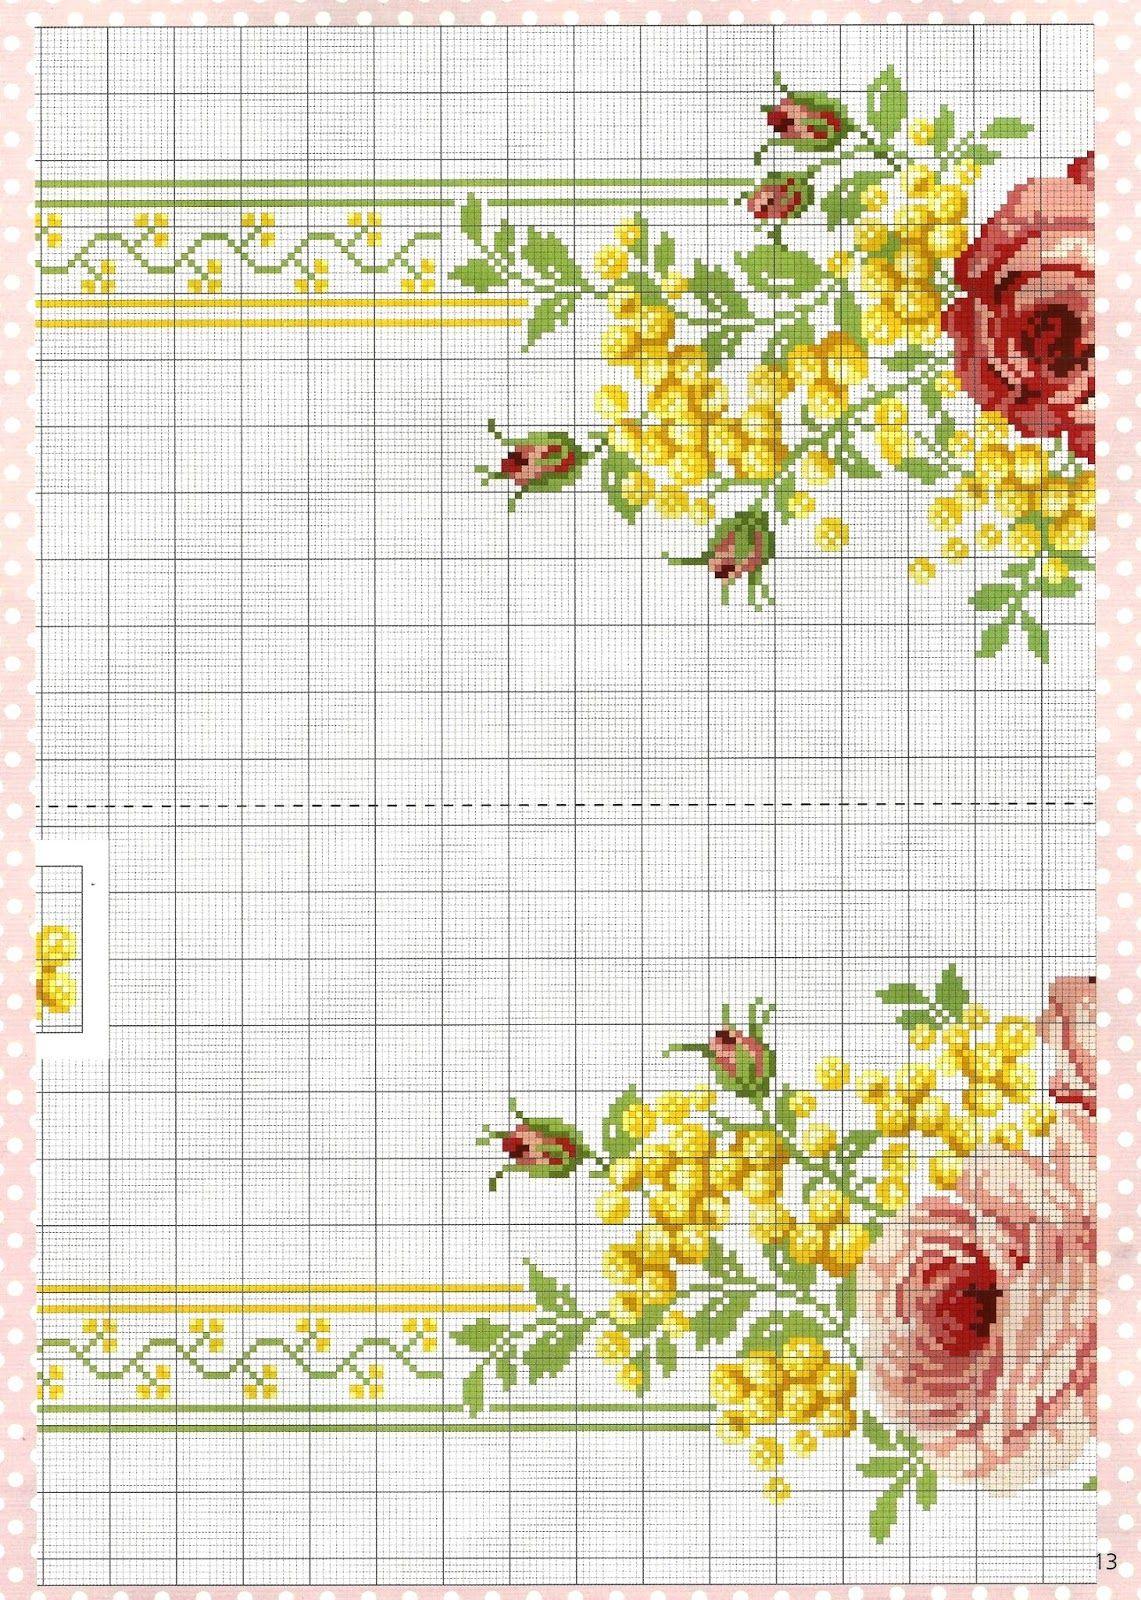 Pinterest punto croce ea84 regardsdefemmes - Disegni punto croce per tovaglie da tavola ...